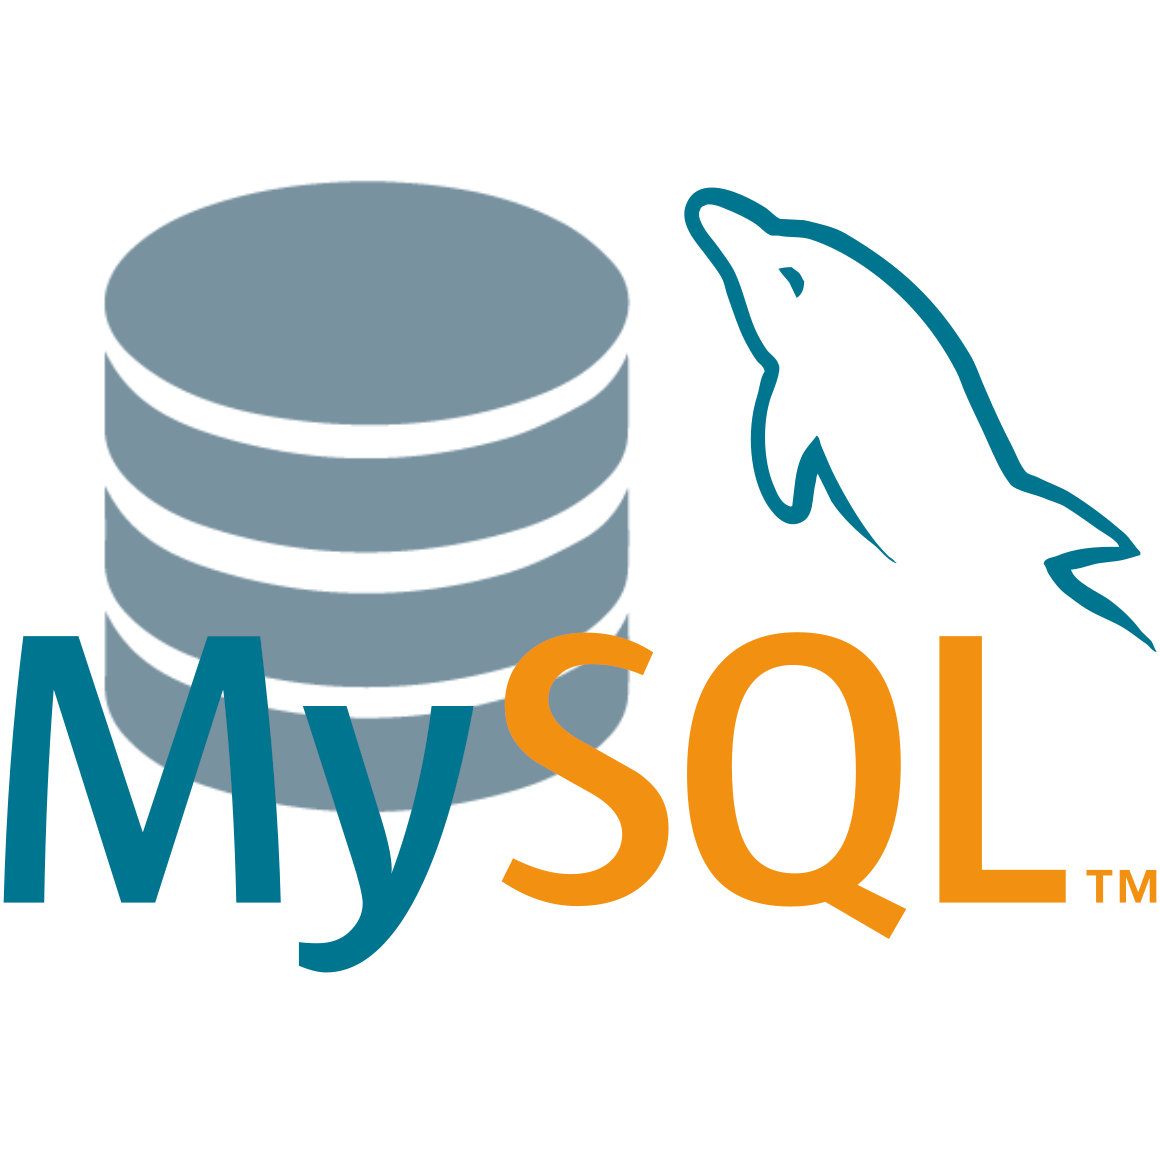 nodetypes/http%3A%2F%2Fdch.uni-koeln.de%2Ftosca%2Fnodetypes/MySQL-DB_5.7.26-w1-wip1/appearance/smallIcon.png